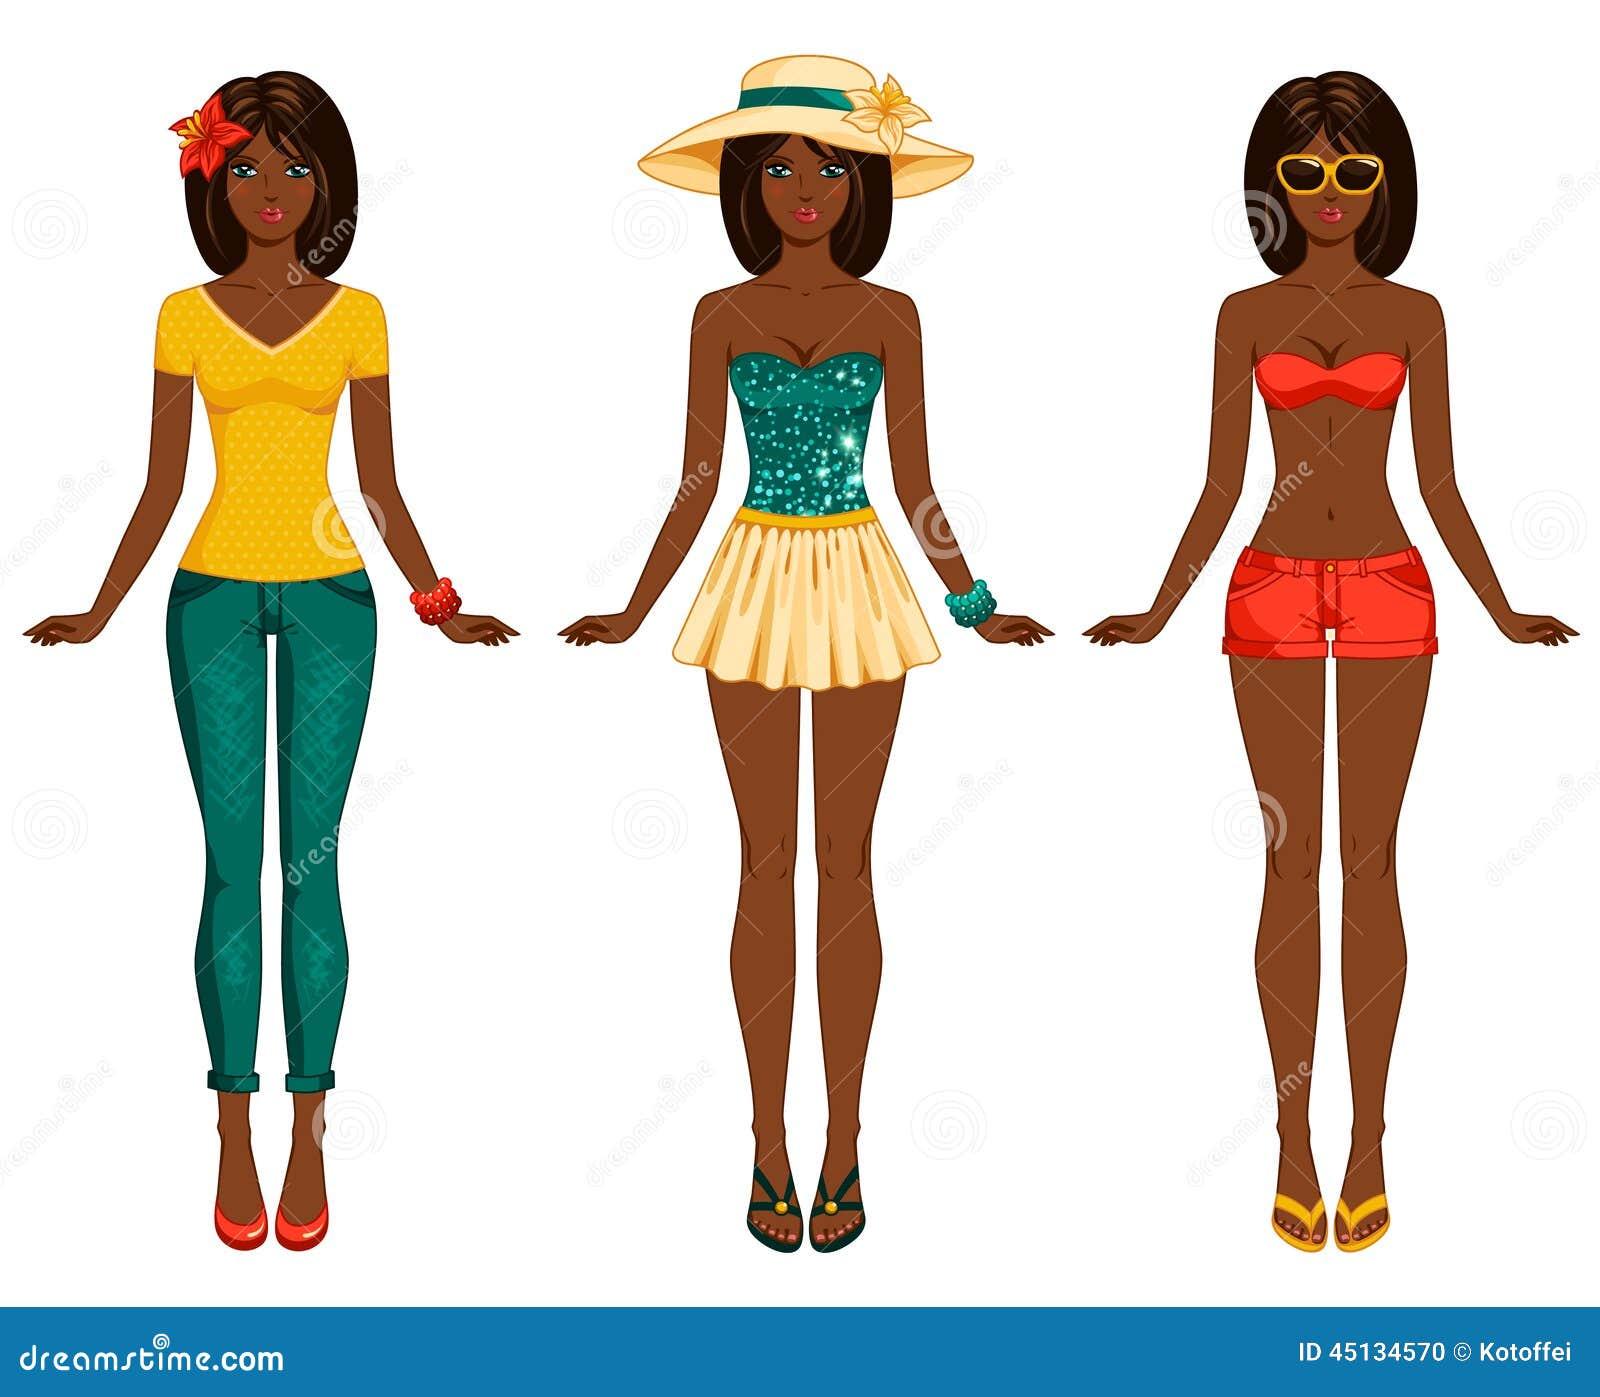 girls in summer clothes vector illustration